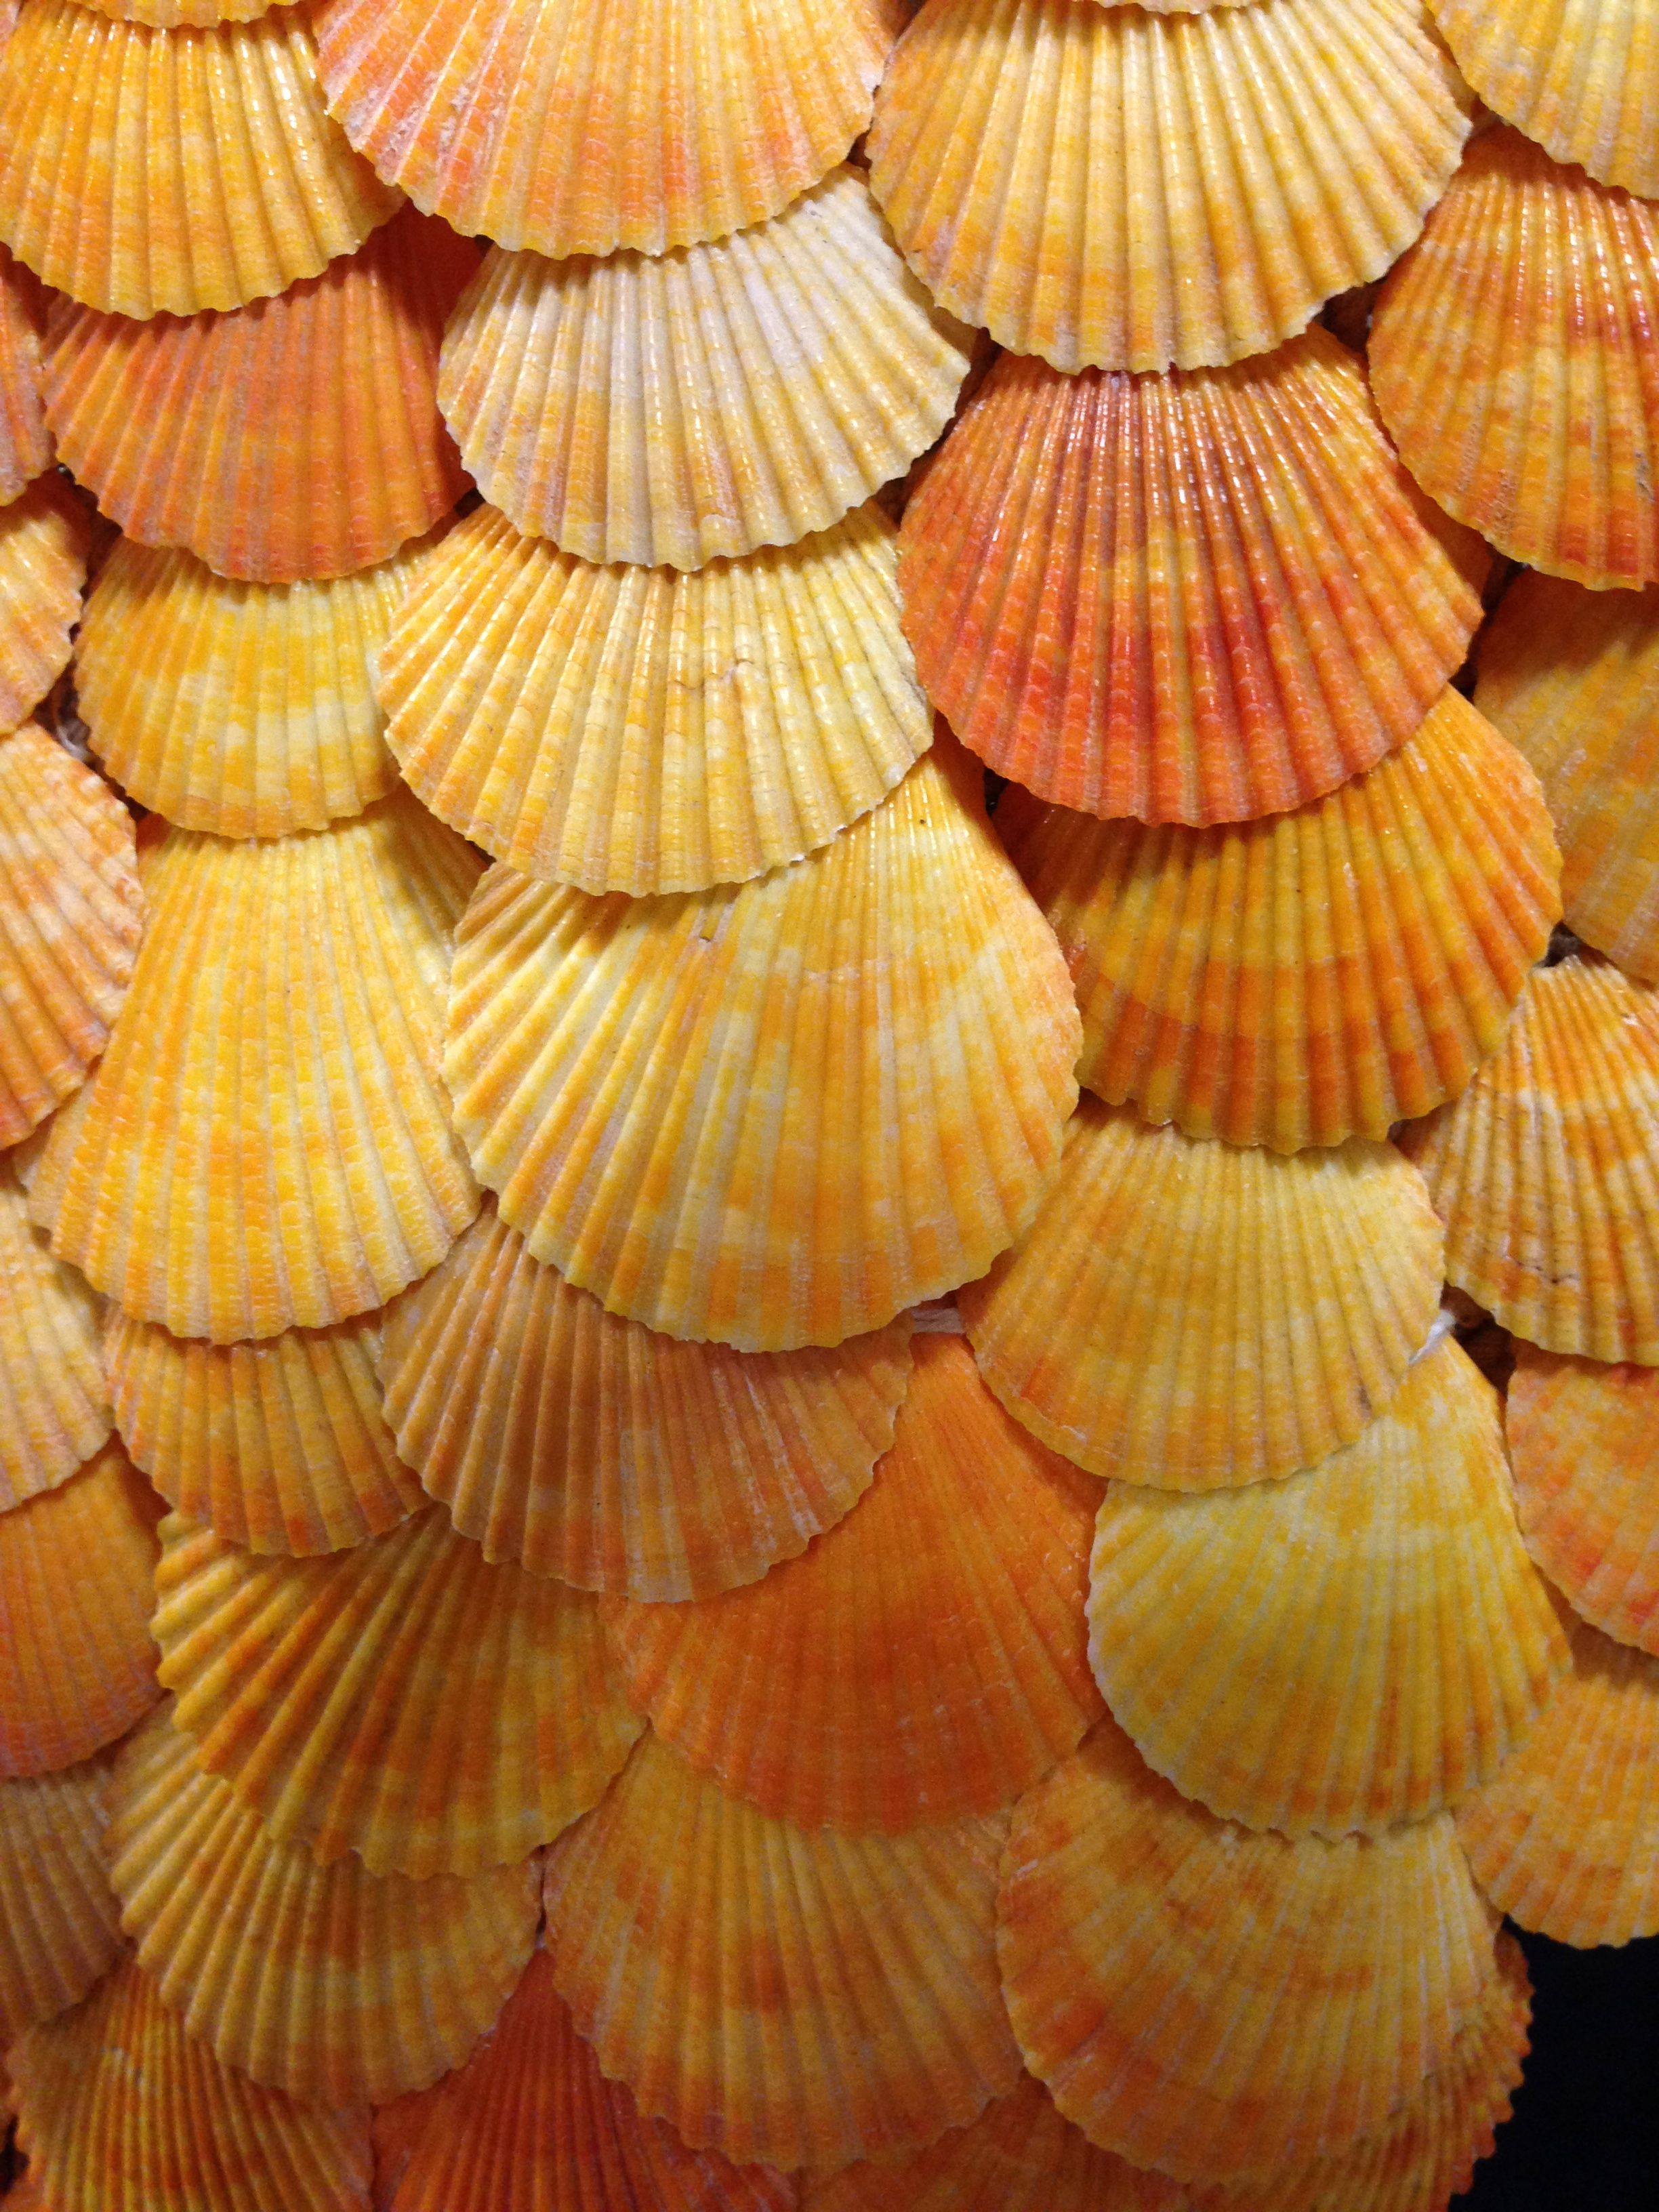 Texture detail for orange seashell necklace art